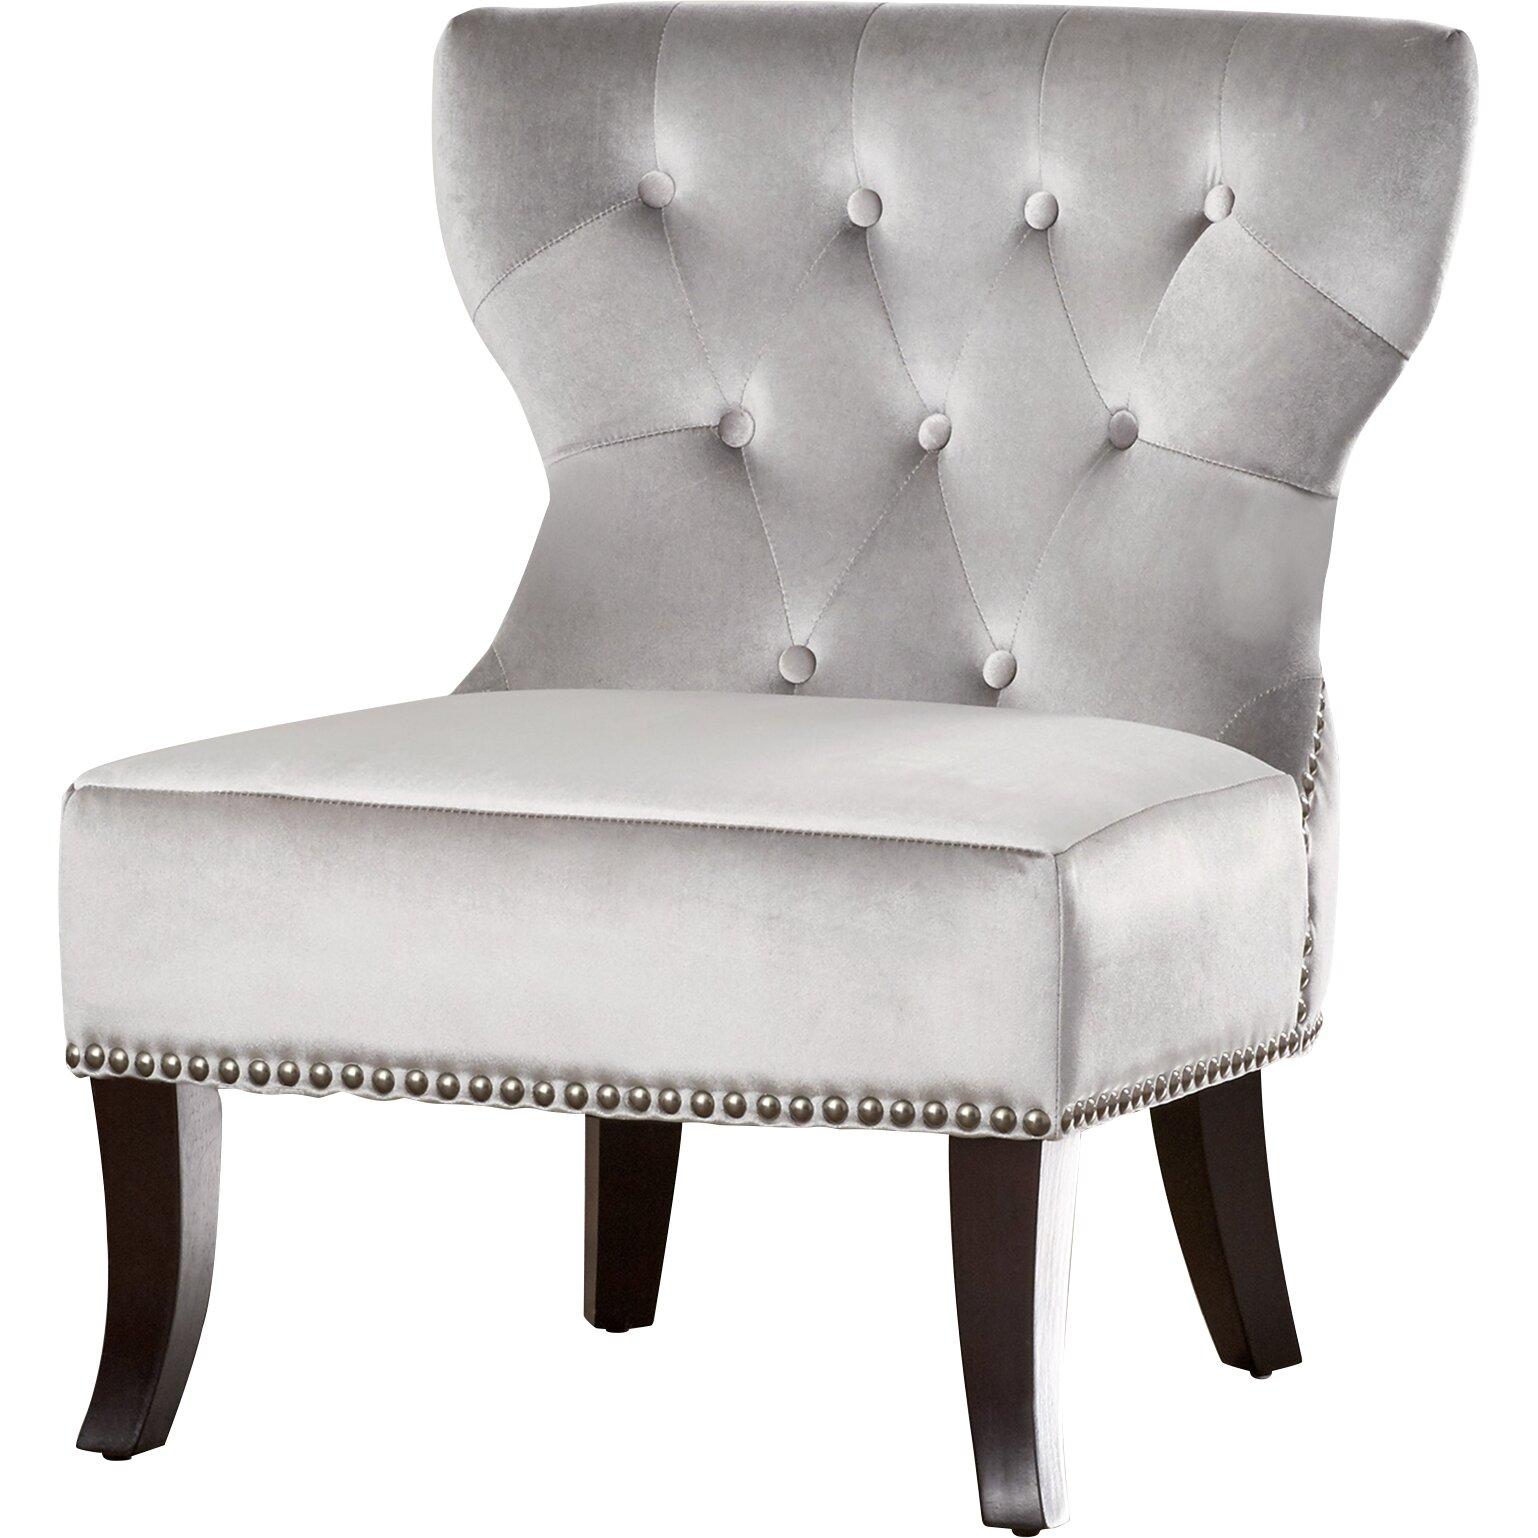 Simpli Home Kitchener Accent Slipper Chair Amp Reviews Wayfair